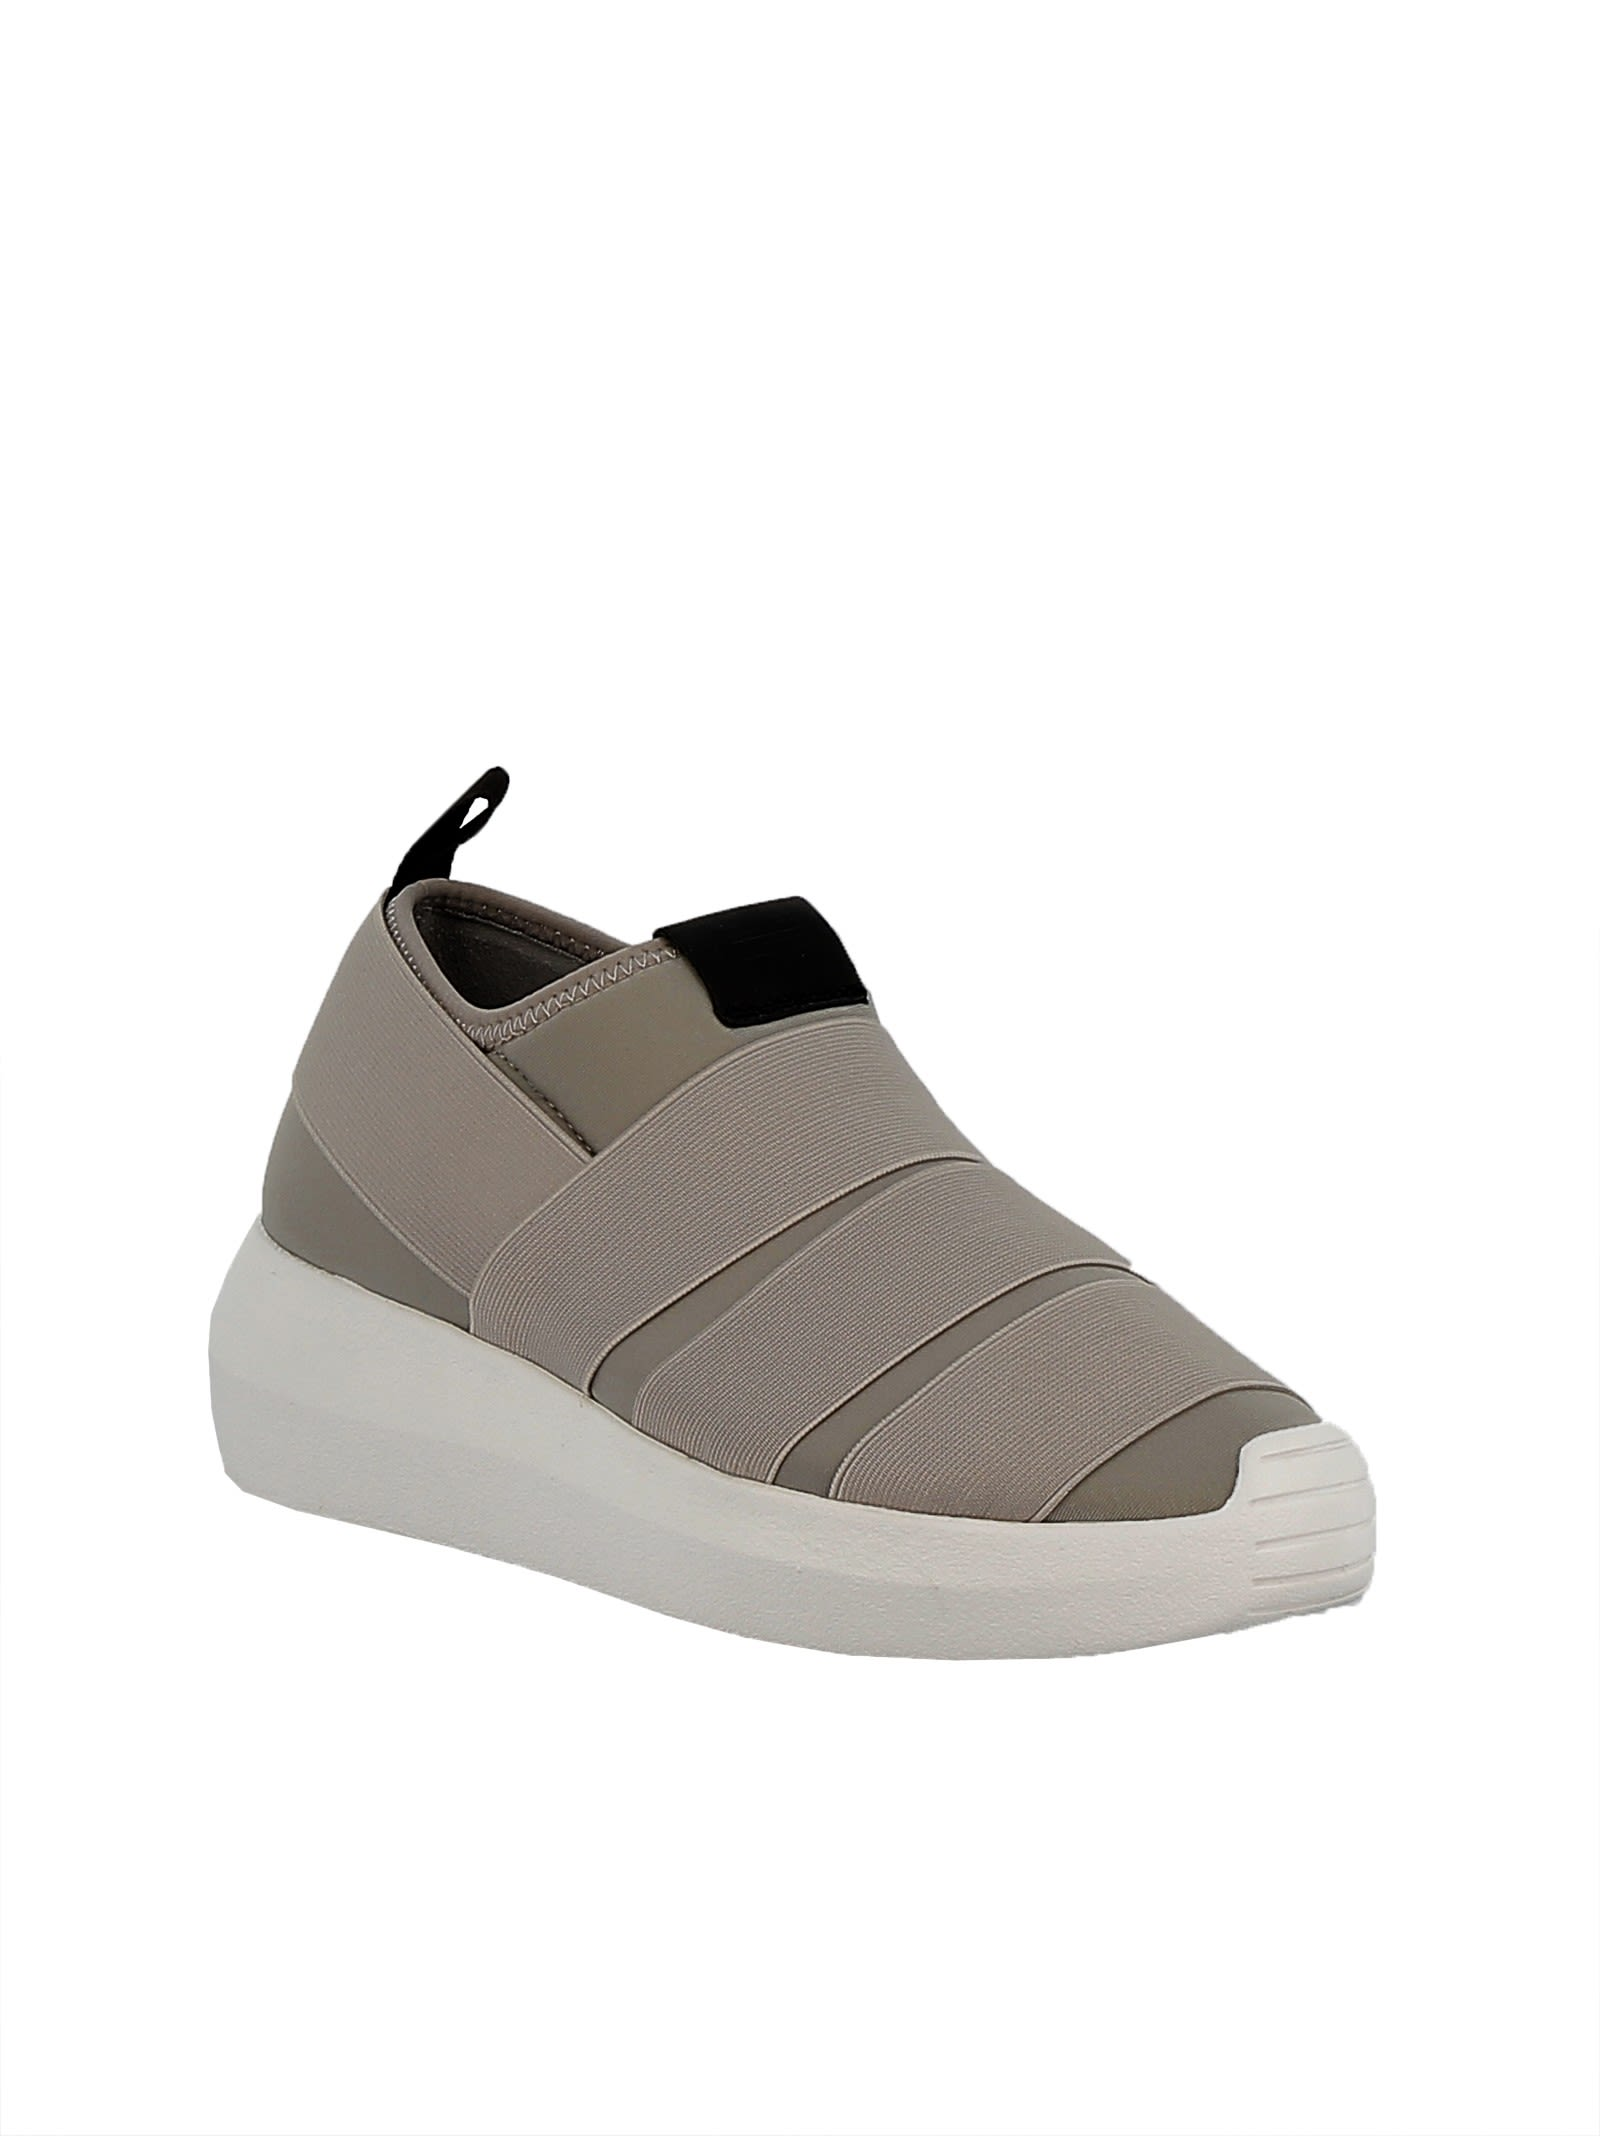 Chaussures De Tissu Gris DLSVNF8gi